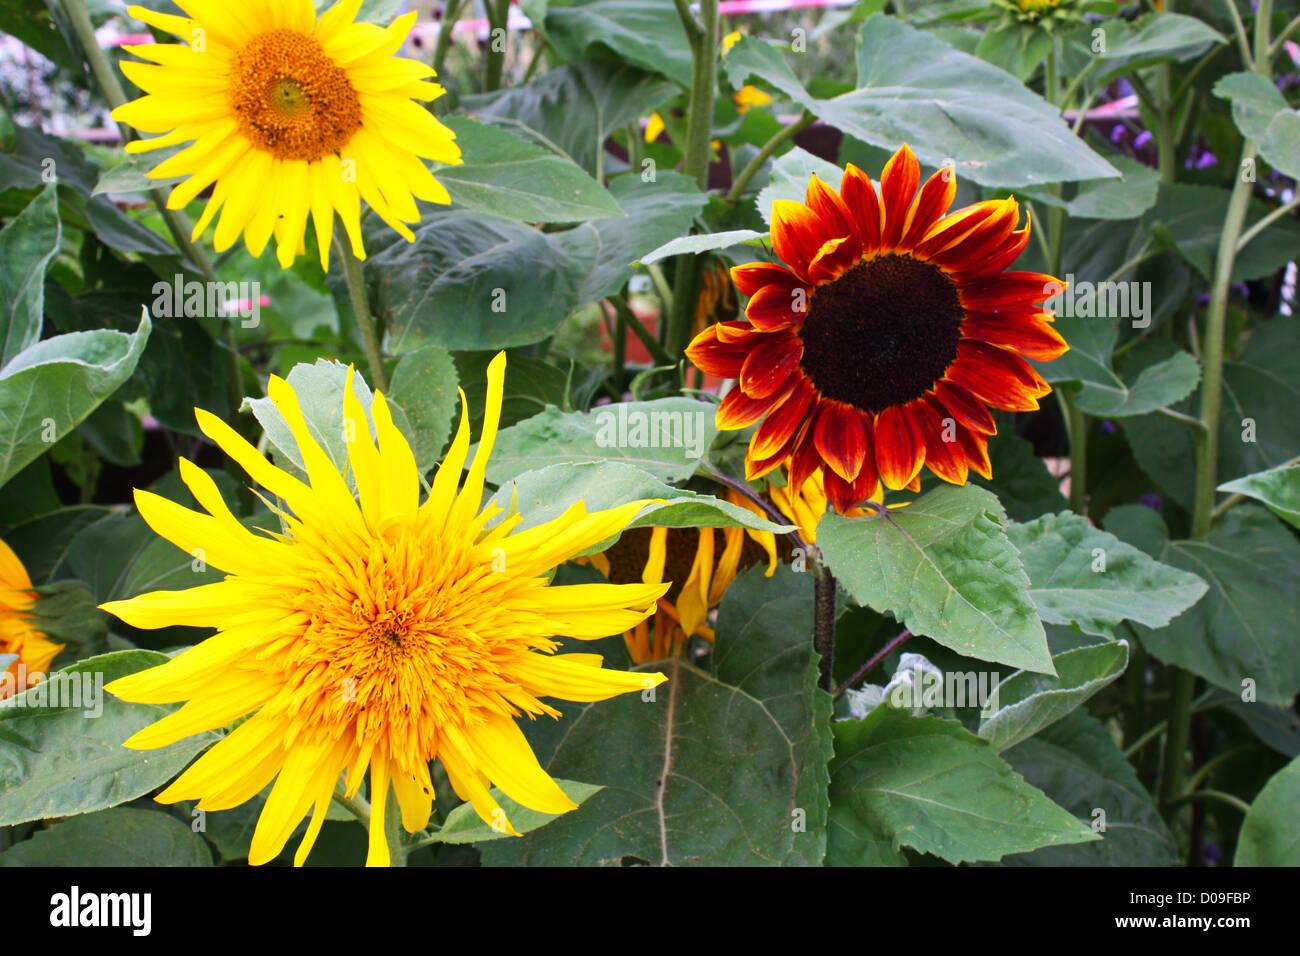 Yellow fresh sun flower plants - Stock Image